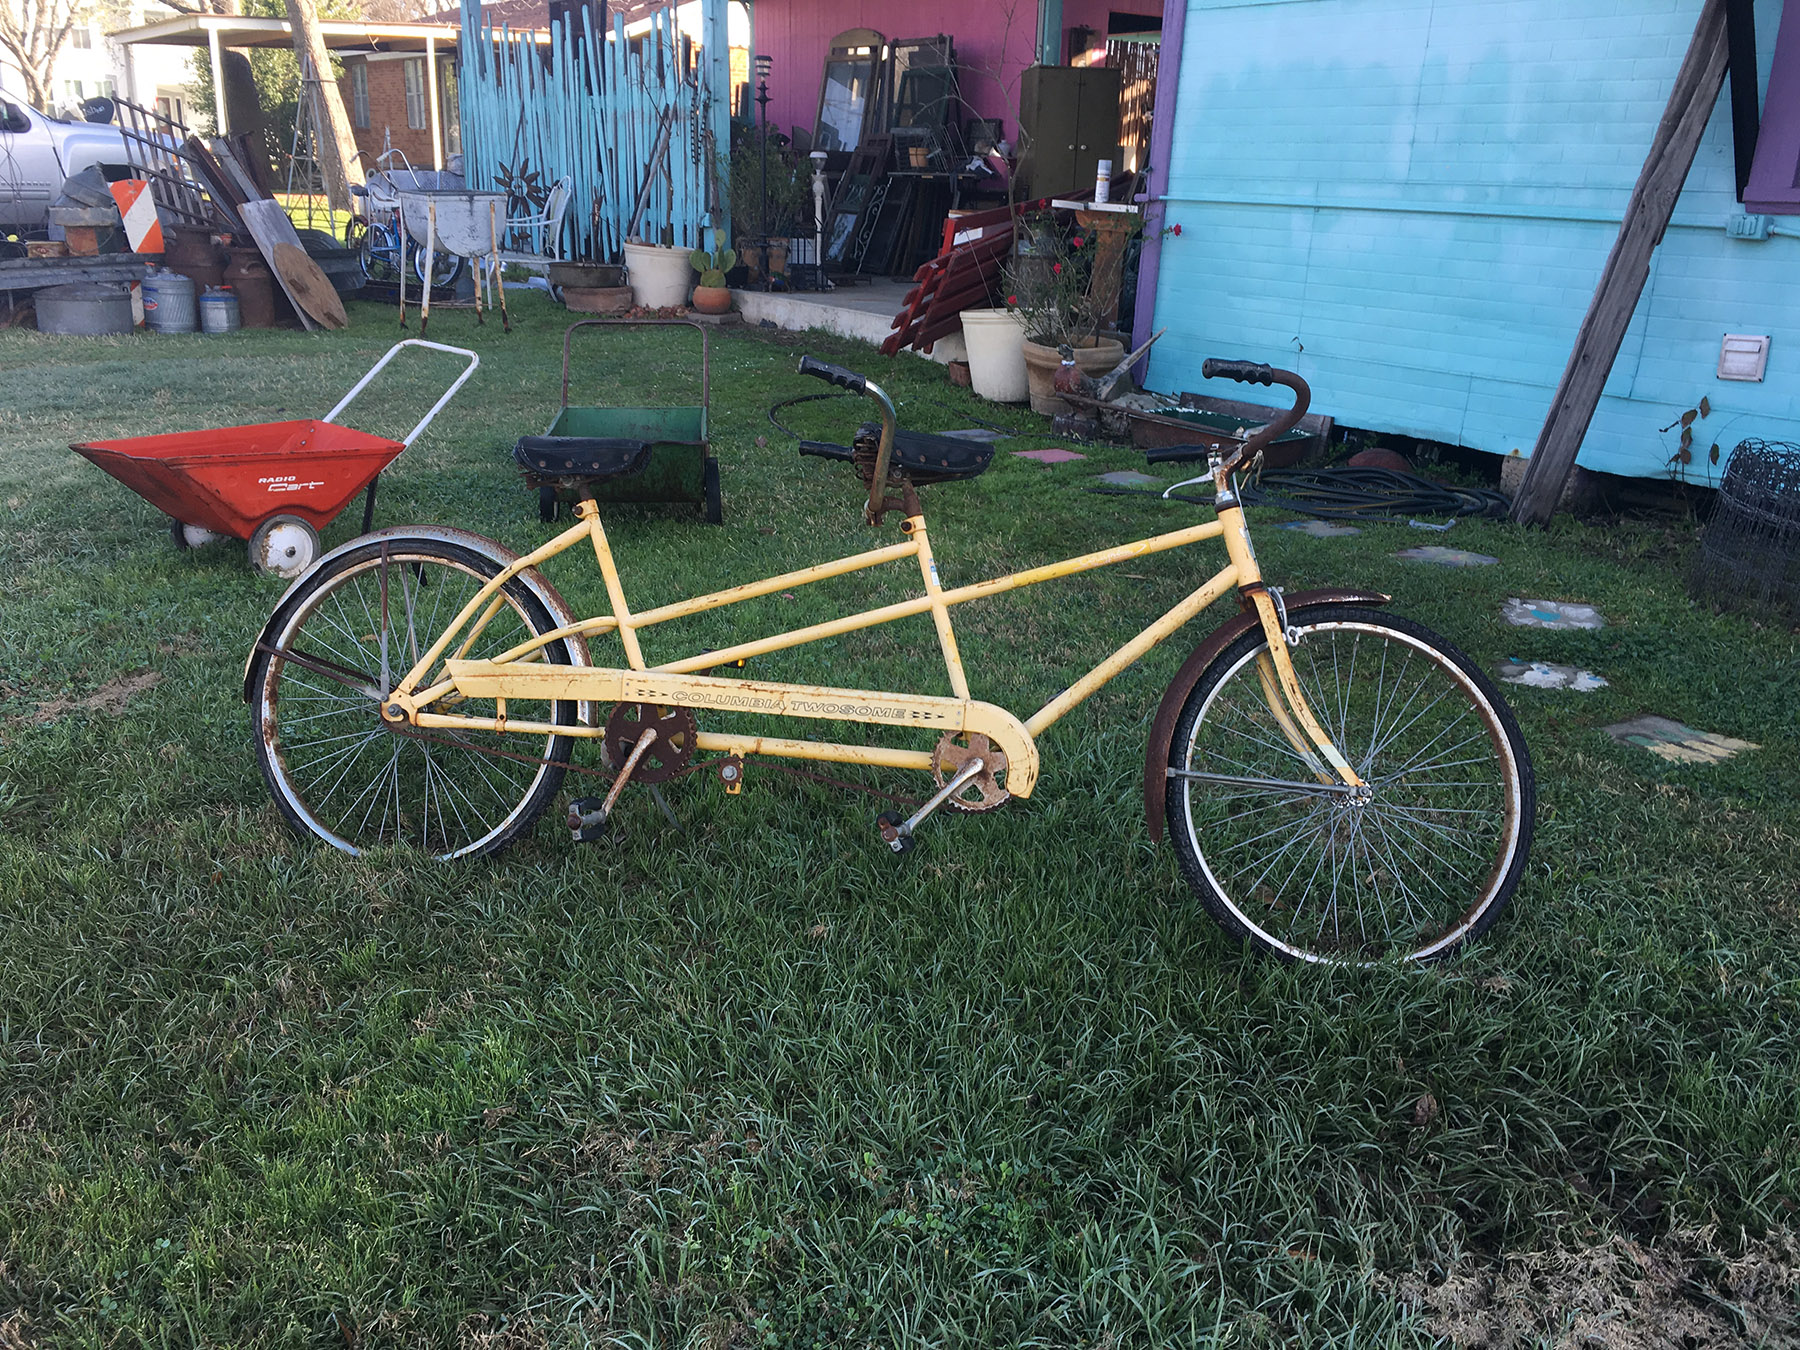 Rusty tandem bike